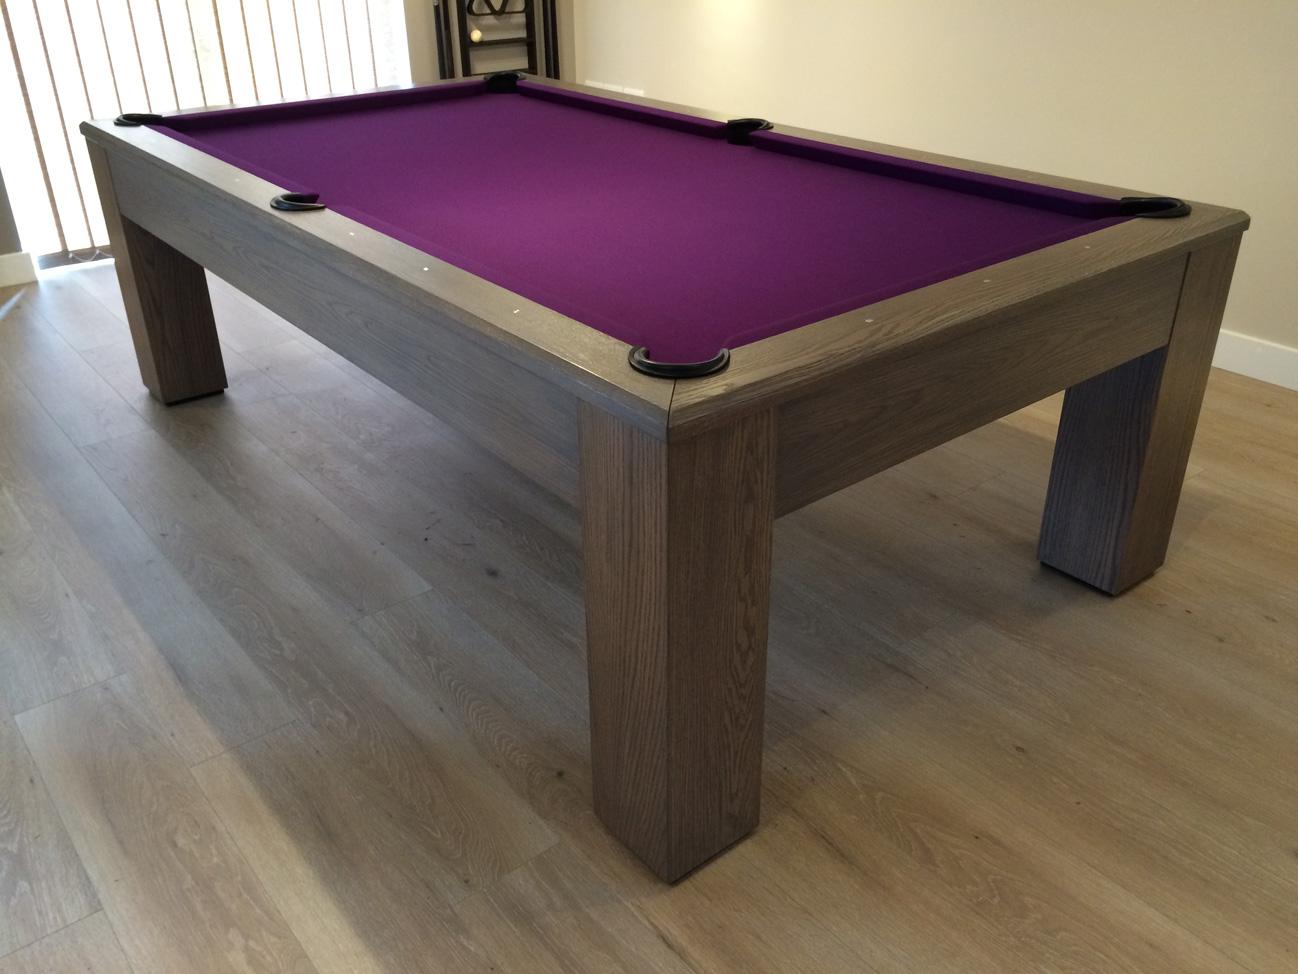 Olhausen Madison Ft Pool Table In Oak Modern American Pool Table - Olhausen madison pool table